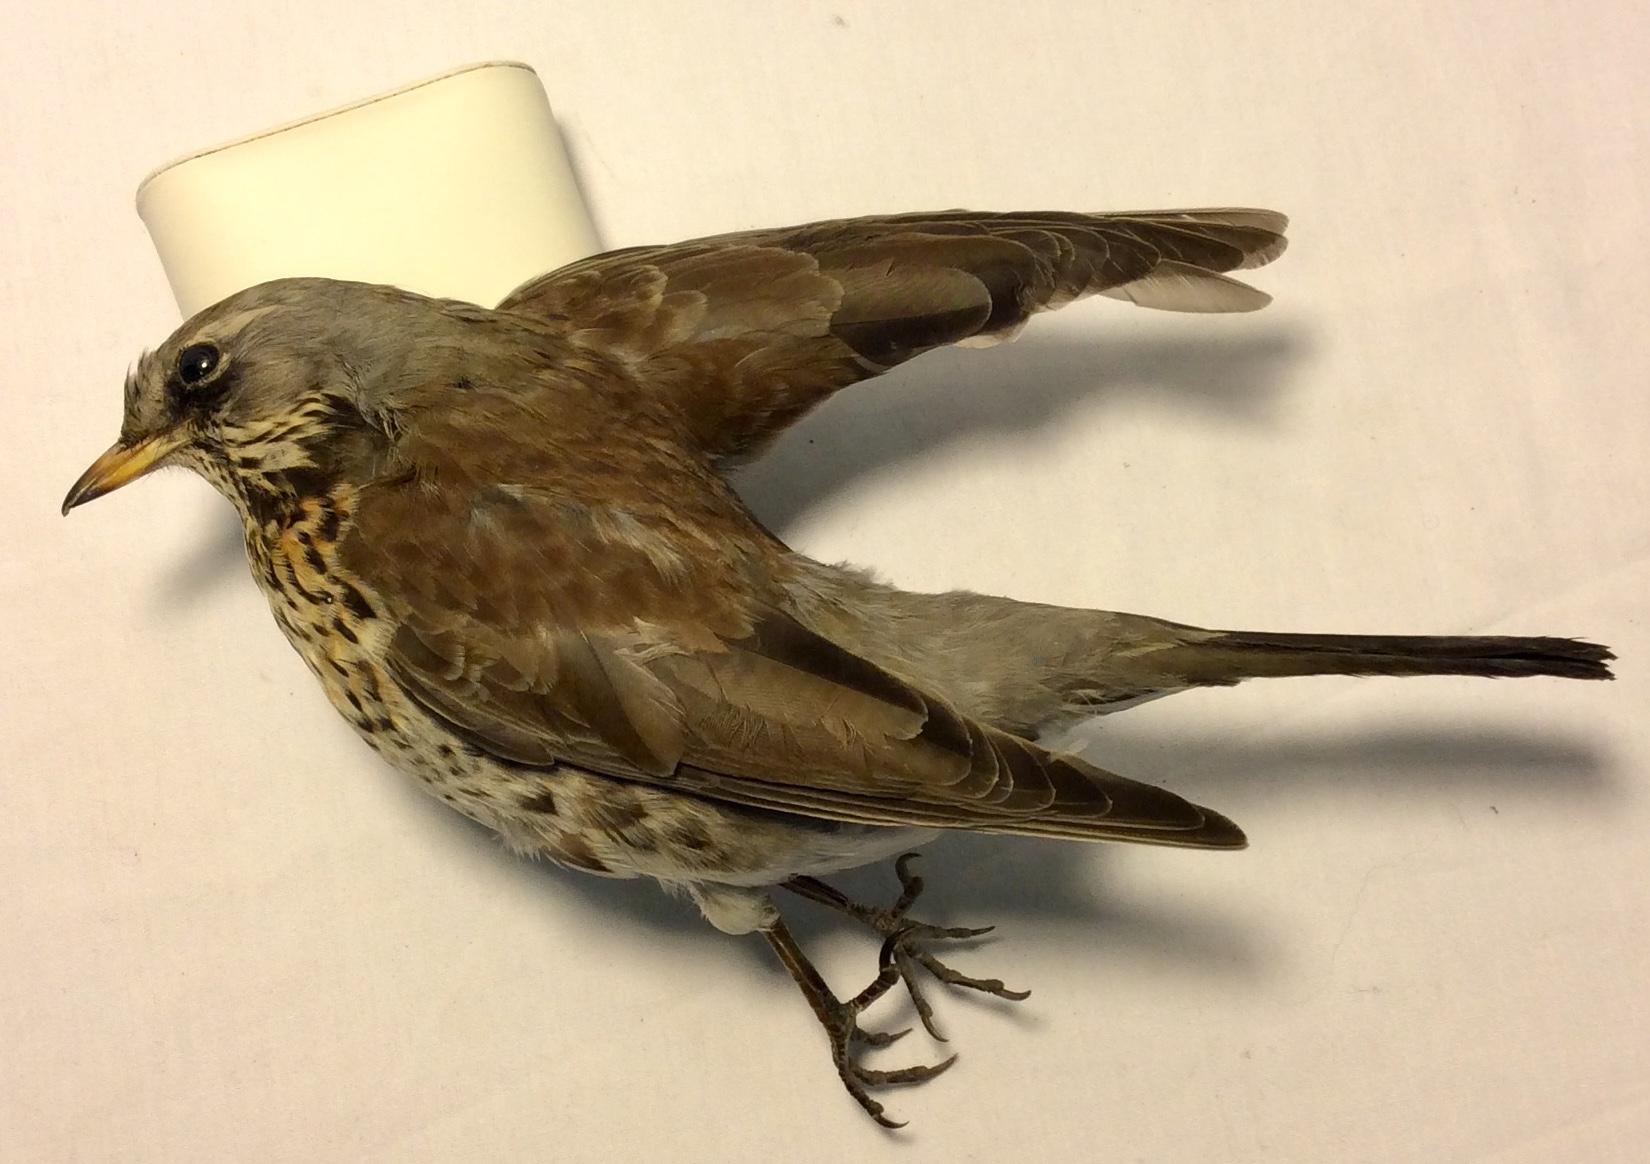 Taxidermy Bicknell's Thrush bird